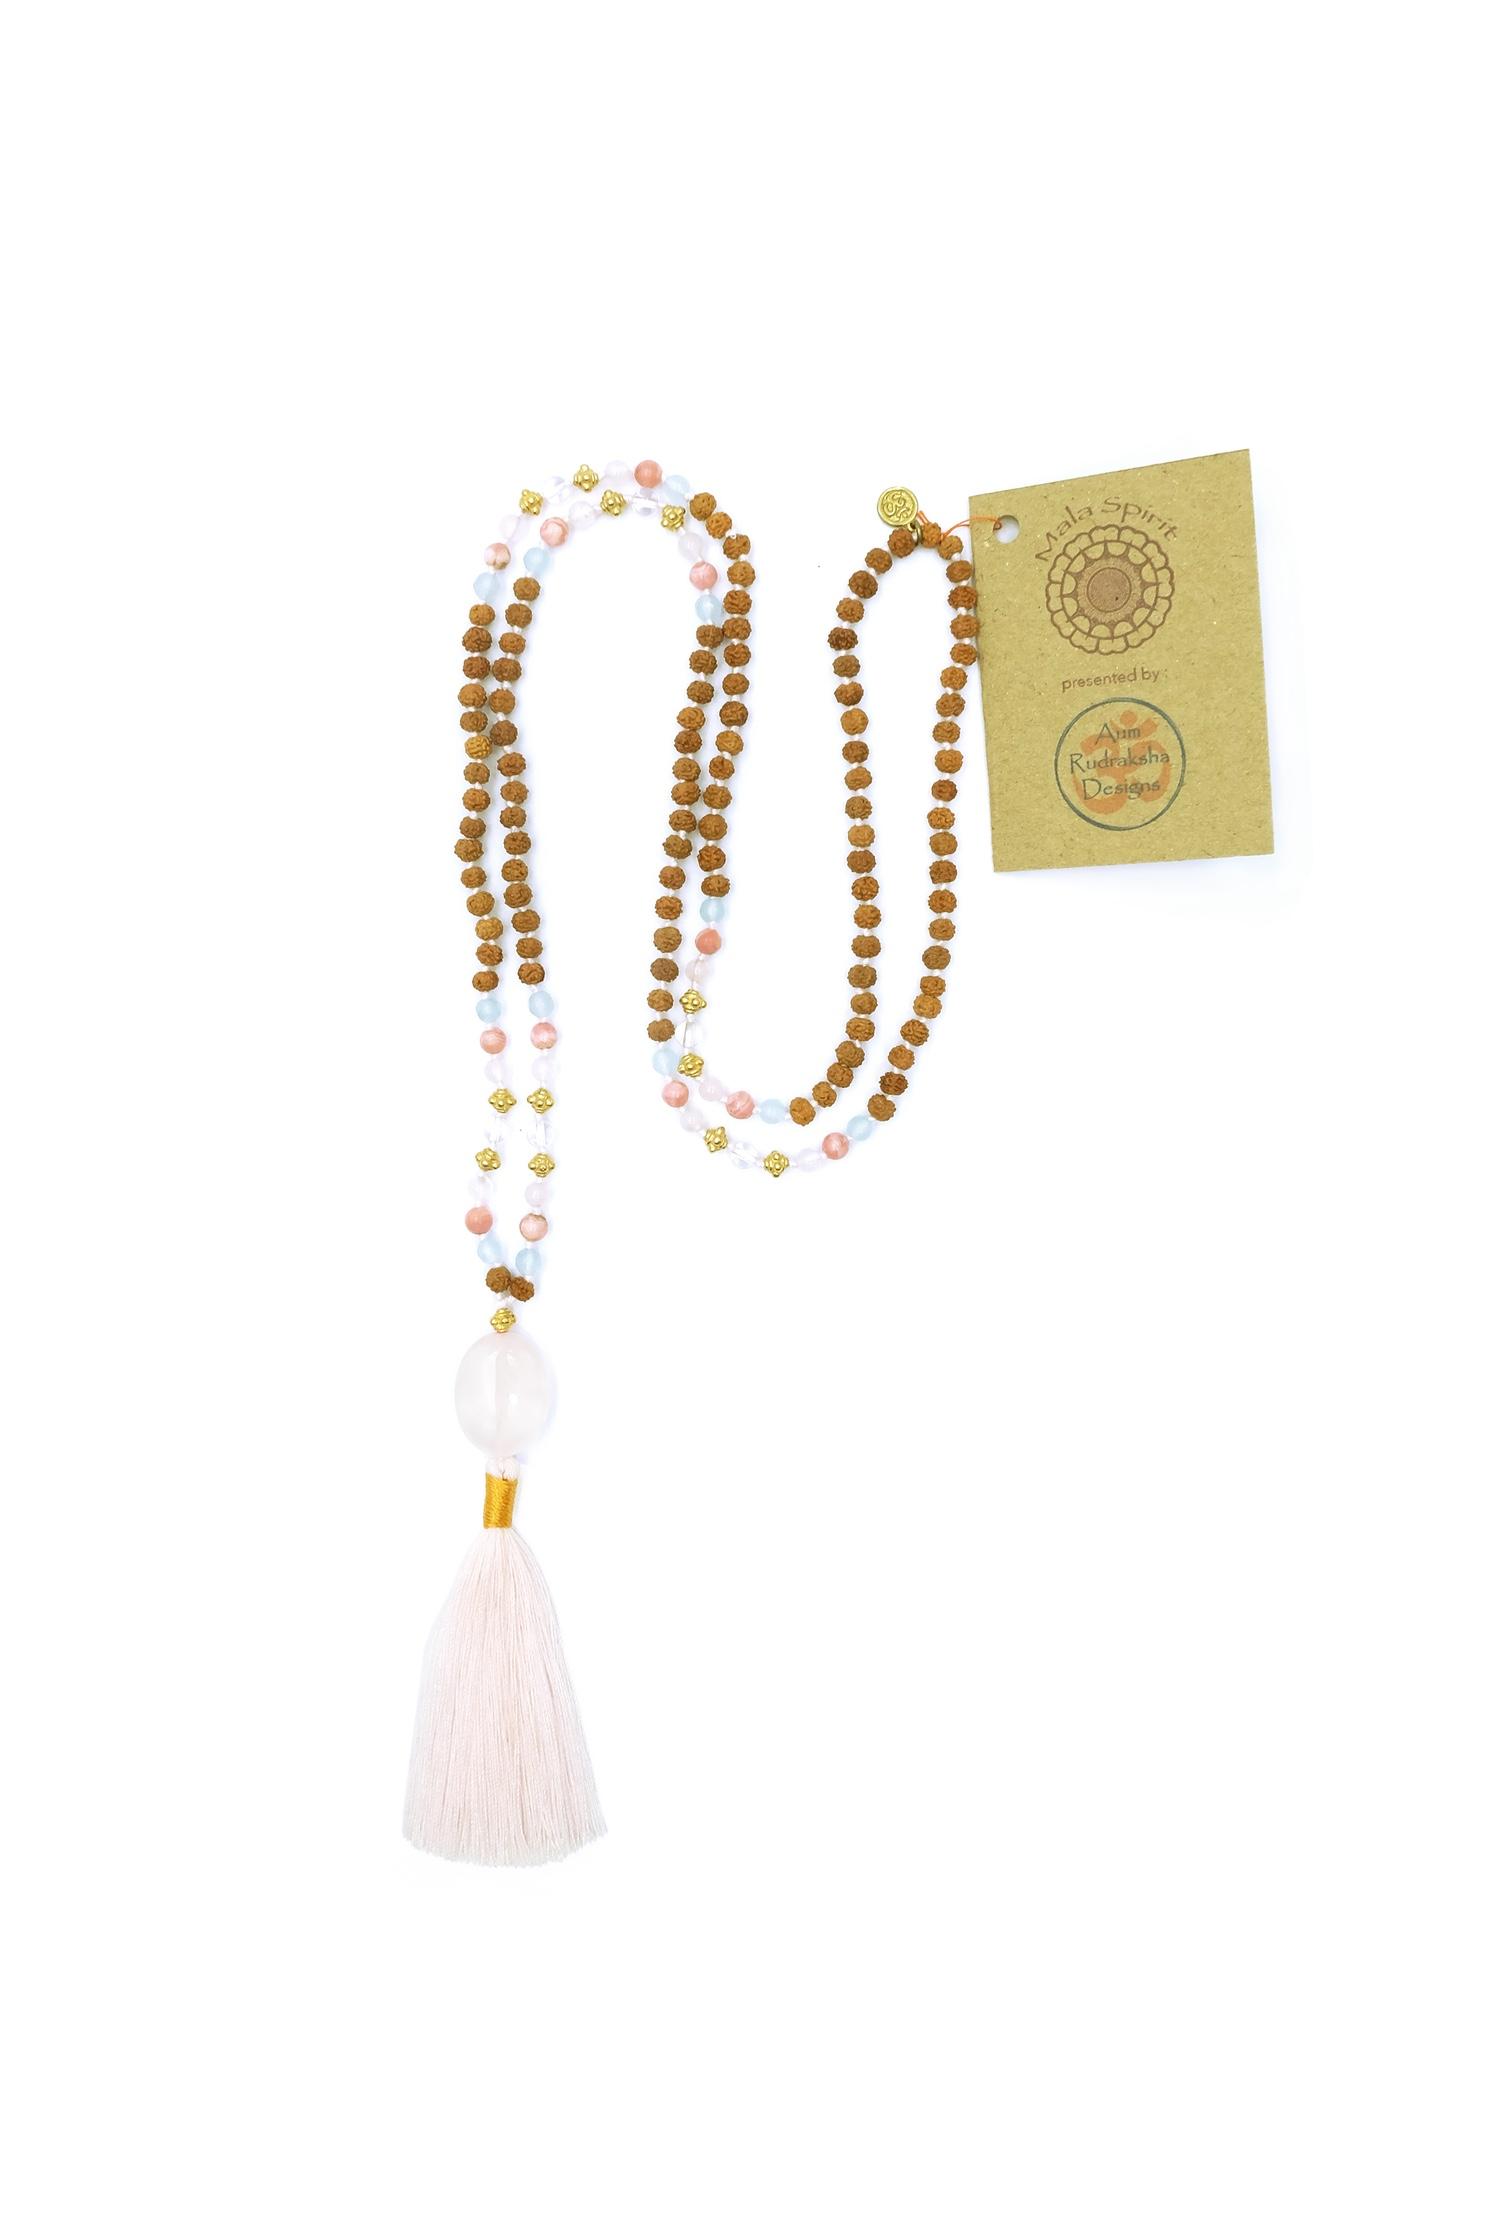 rose-quartz-mala-necklace